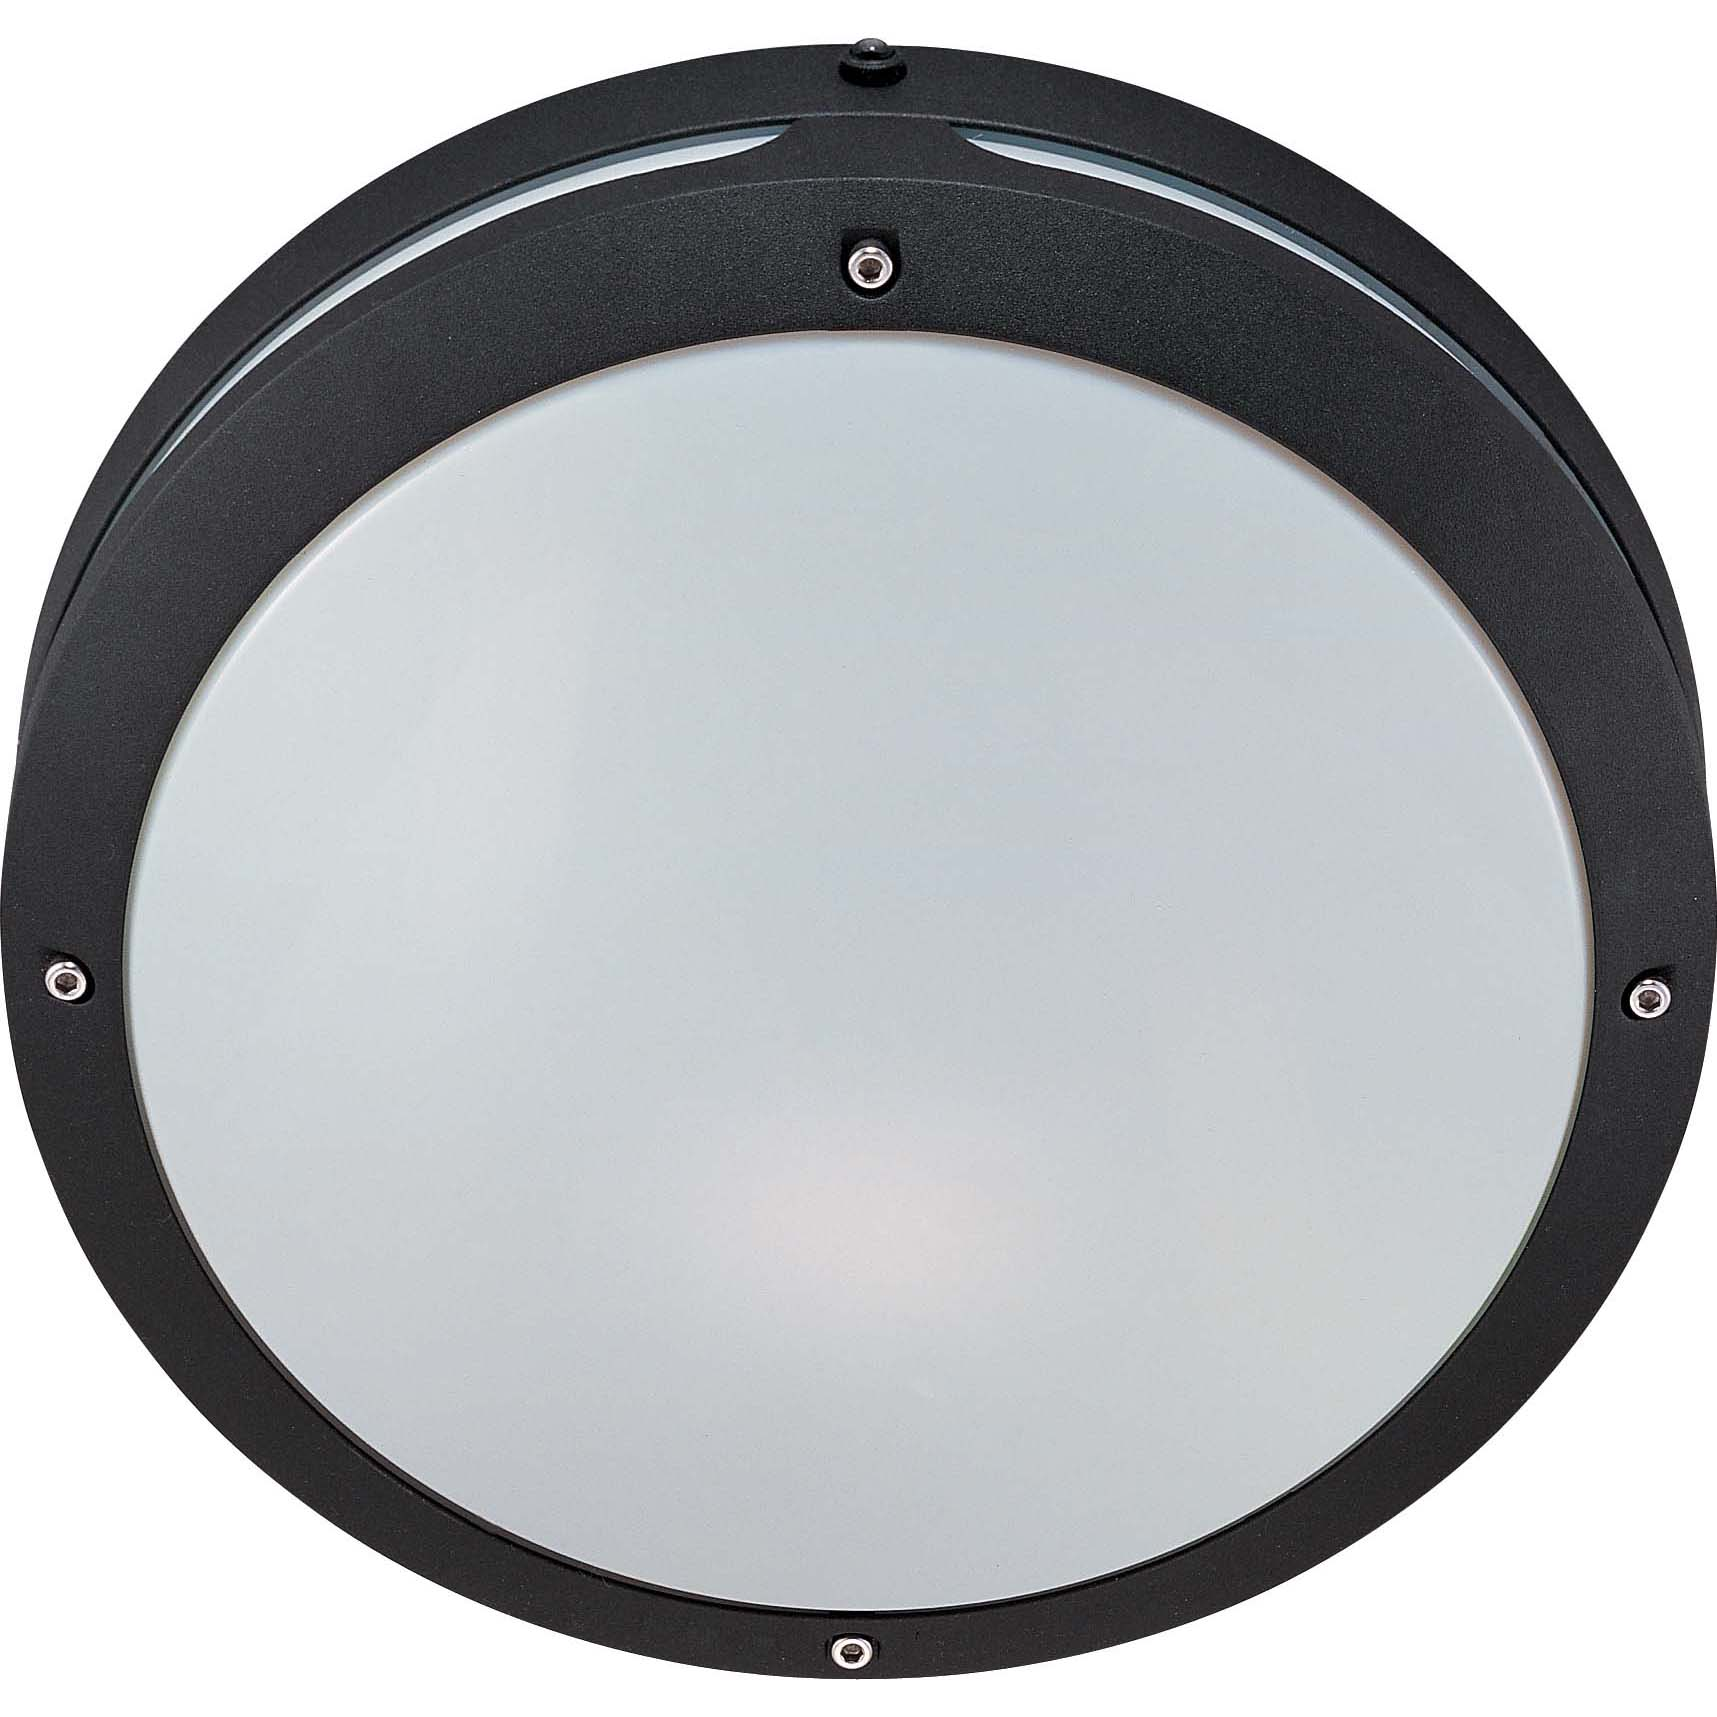 Hudson 2 Light Matte Black With White Lexan Round Wall/Ceiling Fixture